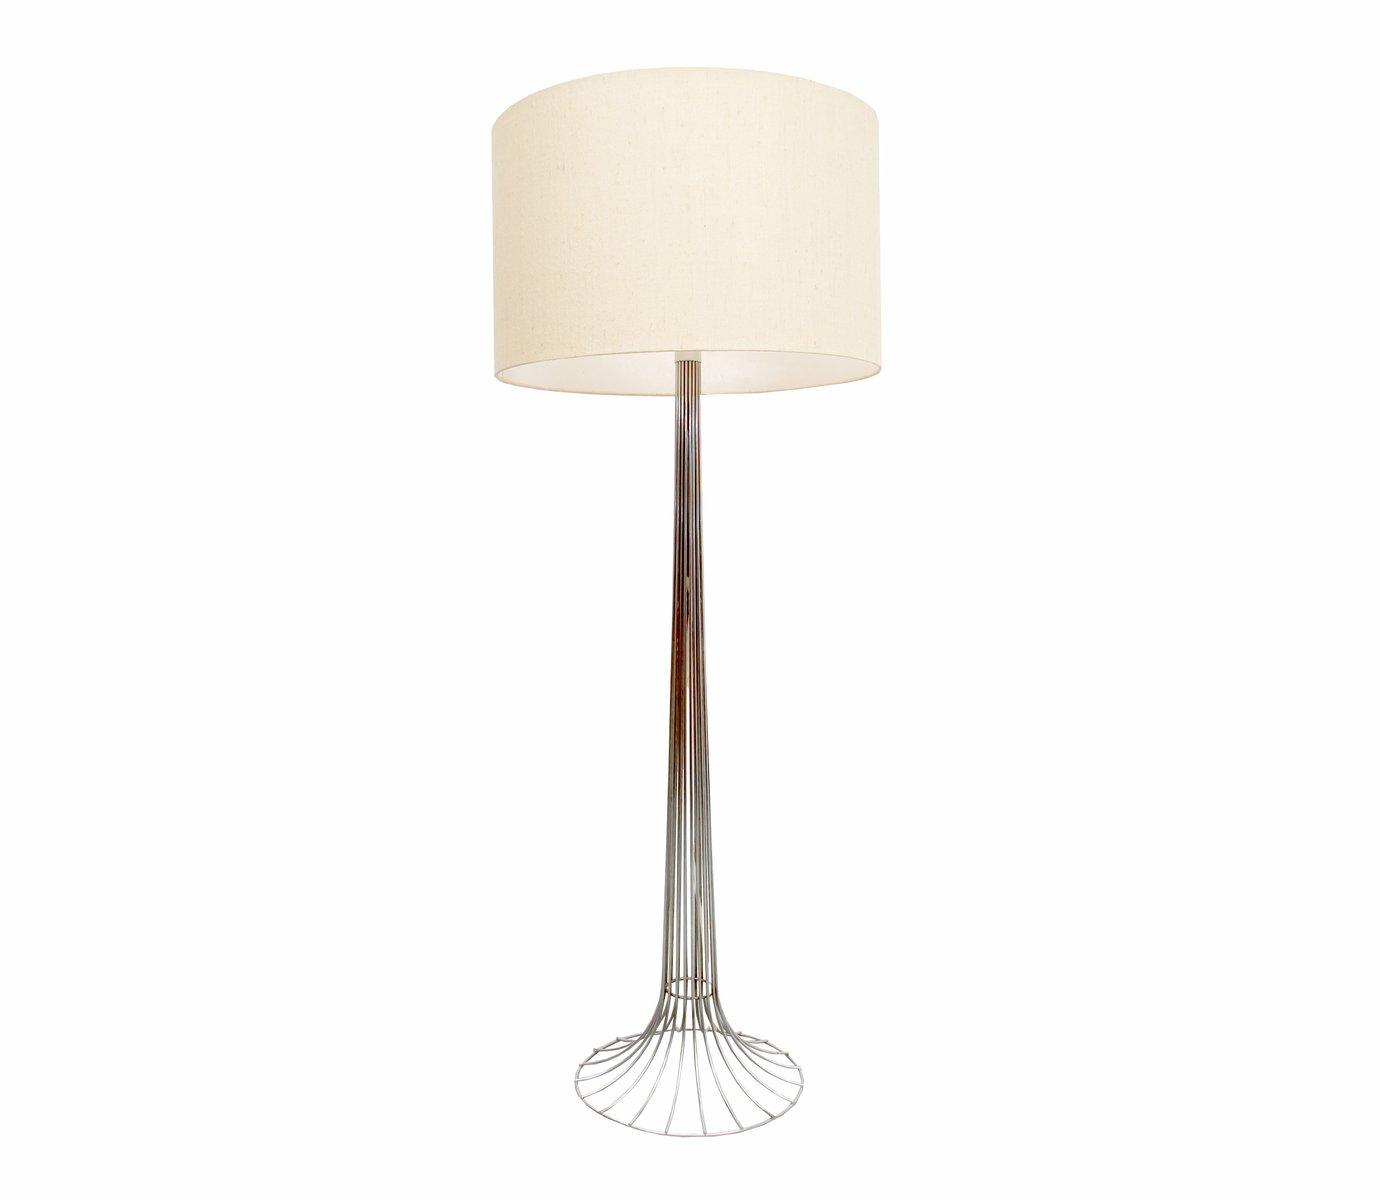 Vintage wire floor lamp by verner panton for fritz hansen for sale vintage wire floor lamp by verner panton for fritz hansen aloadofball Image collections